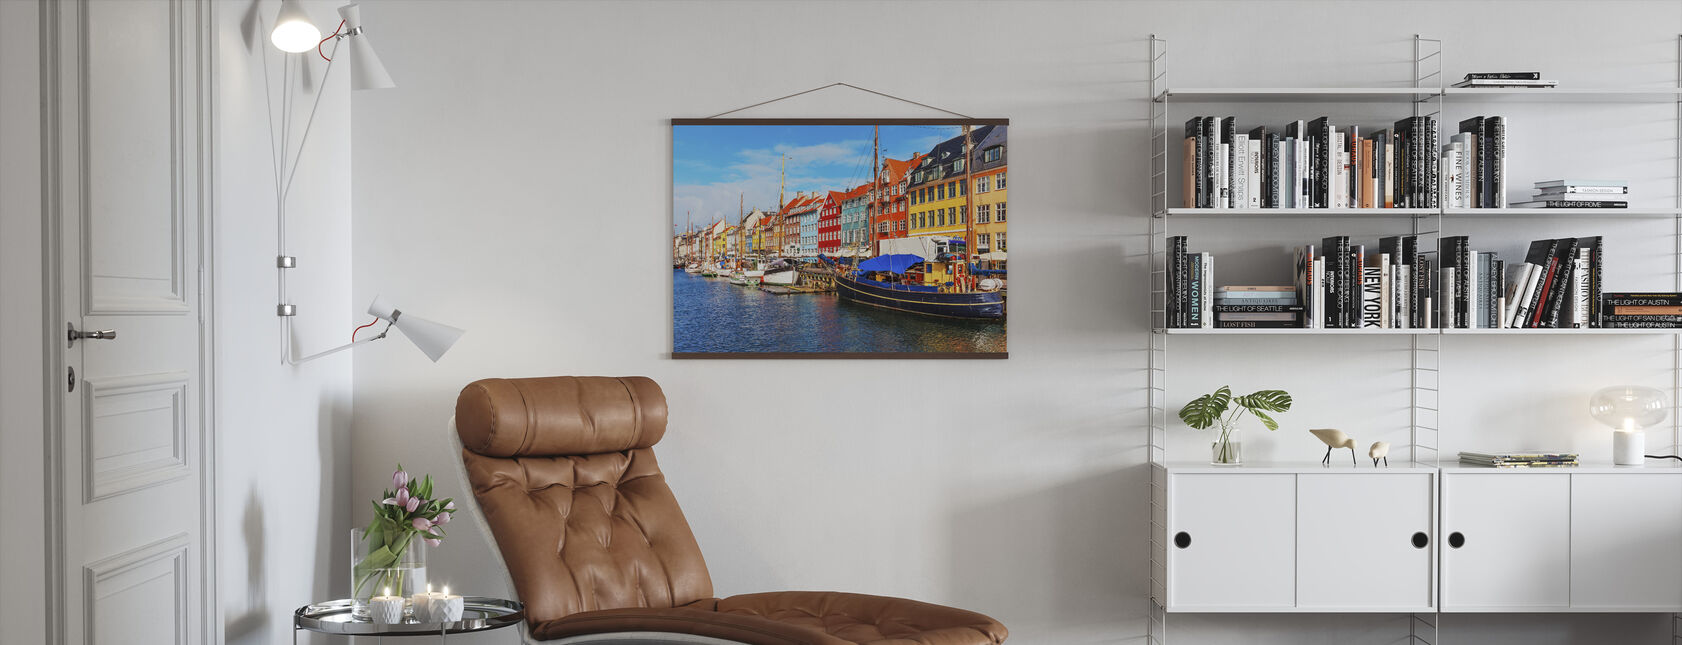 Summer View of Nyhavn Pier - Poster - Living Room